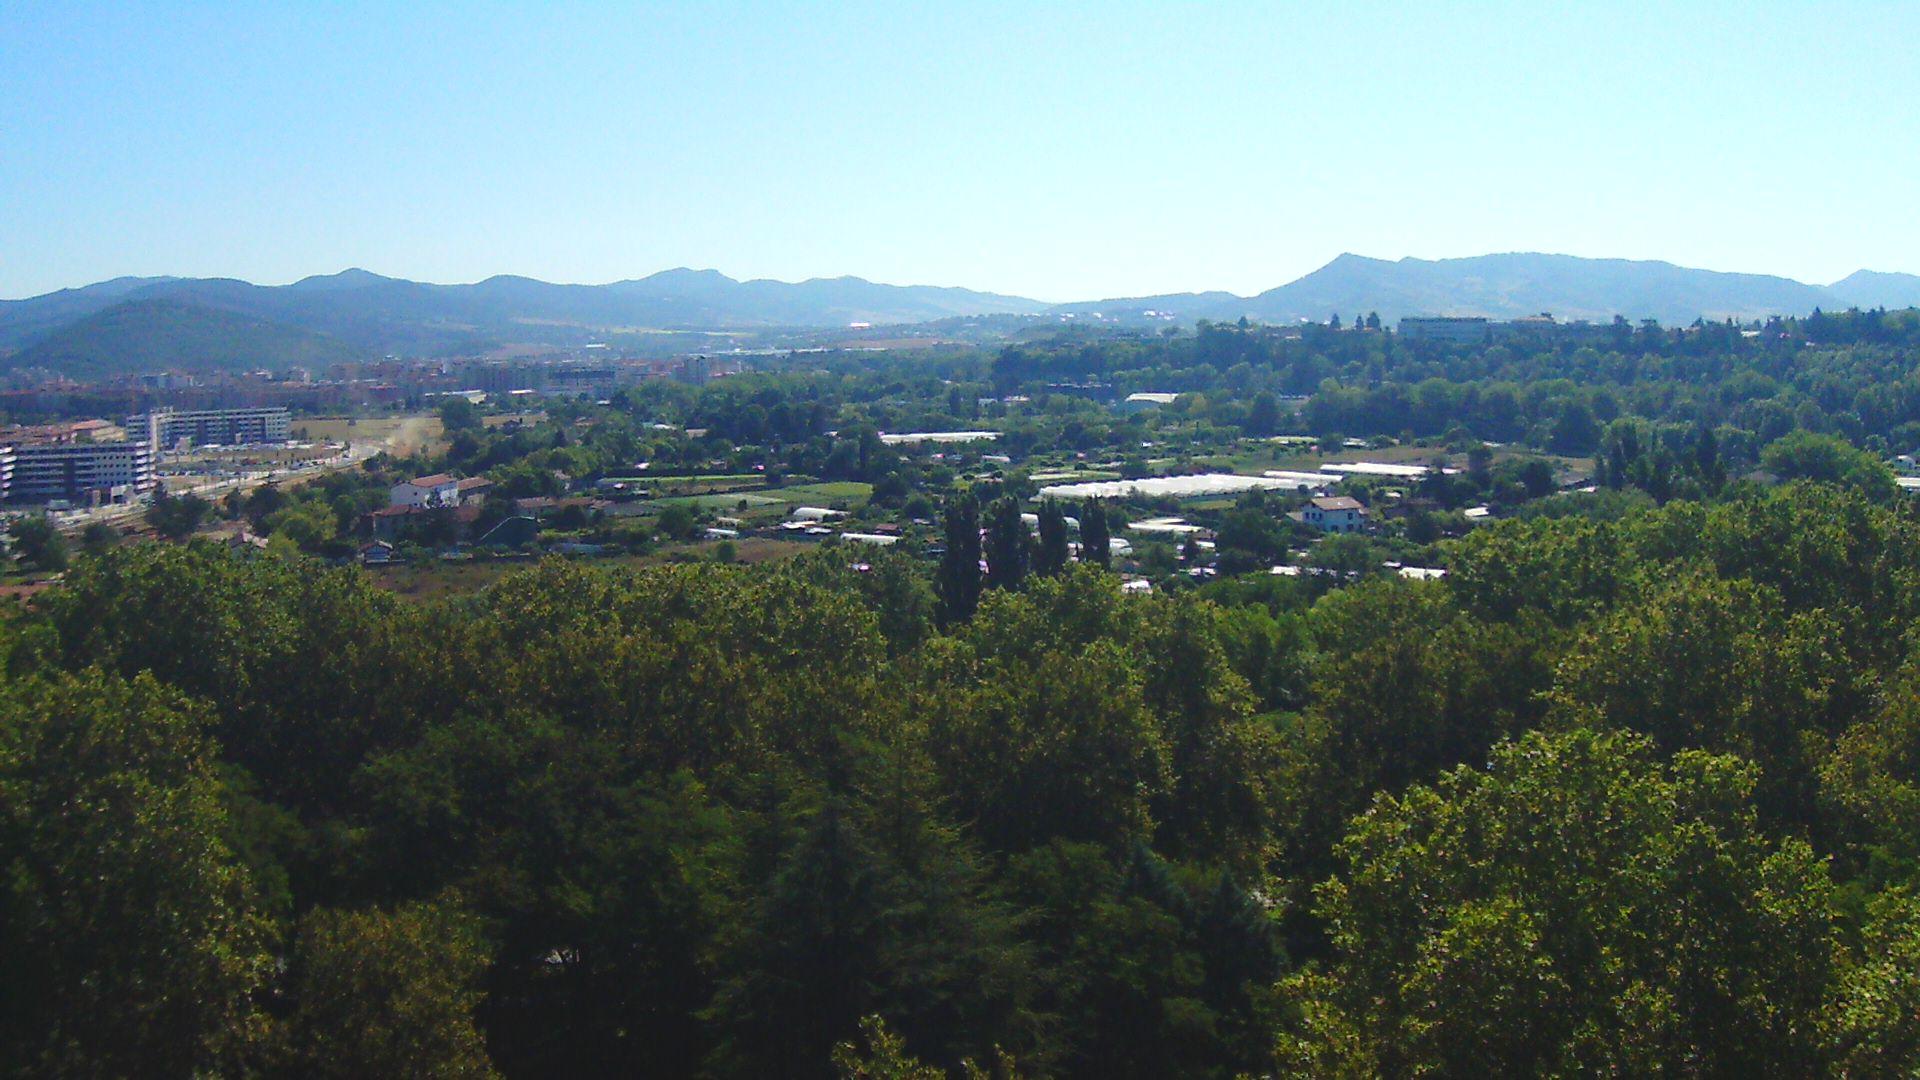 Pamplona So. 10:46